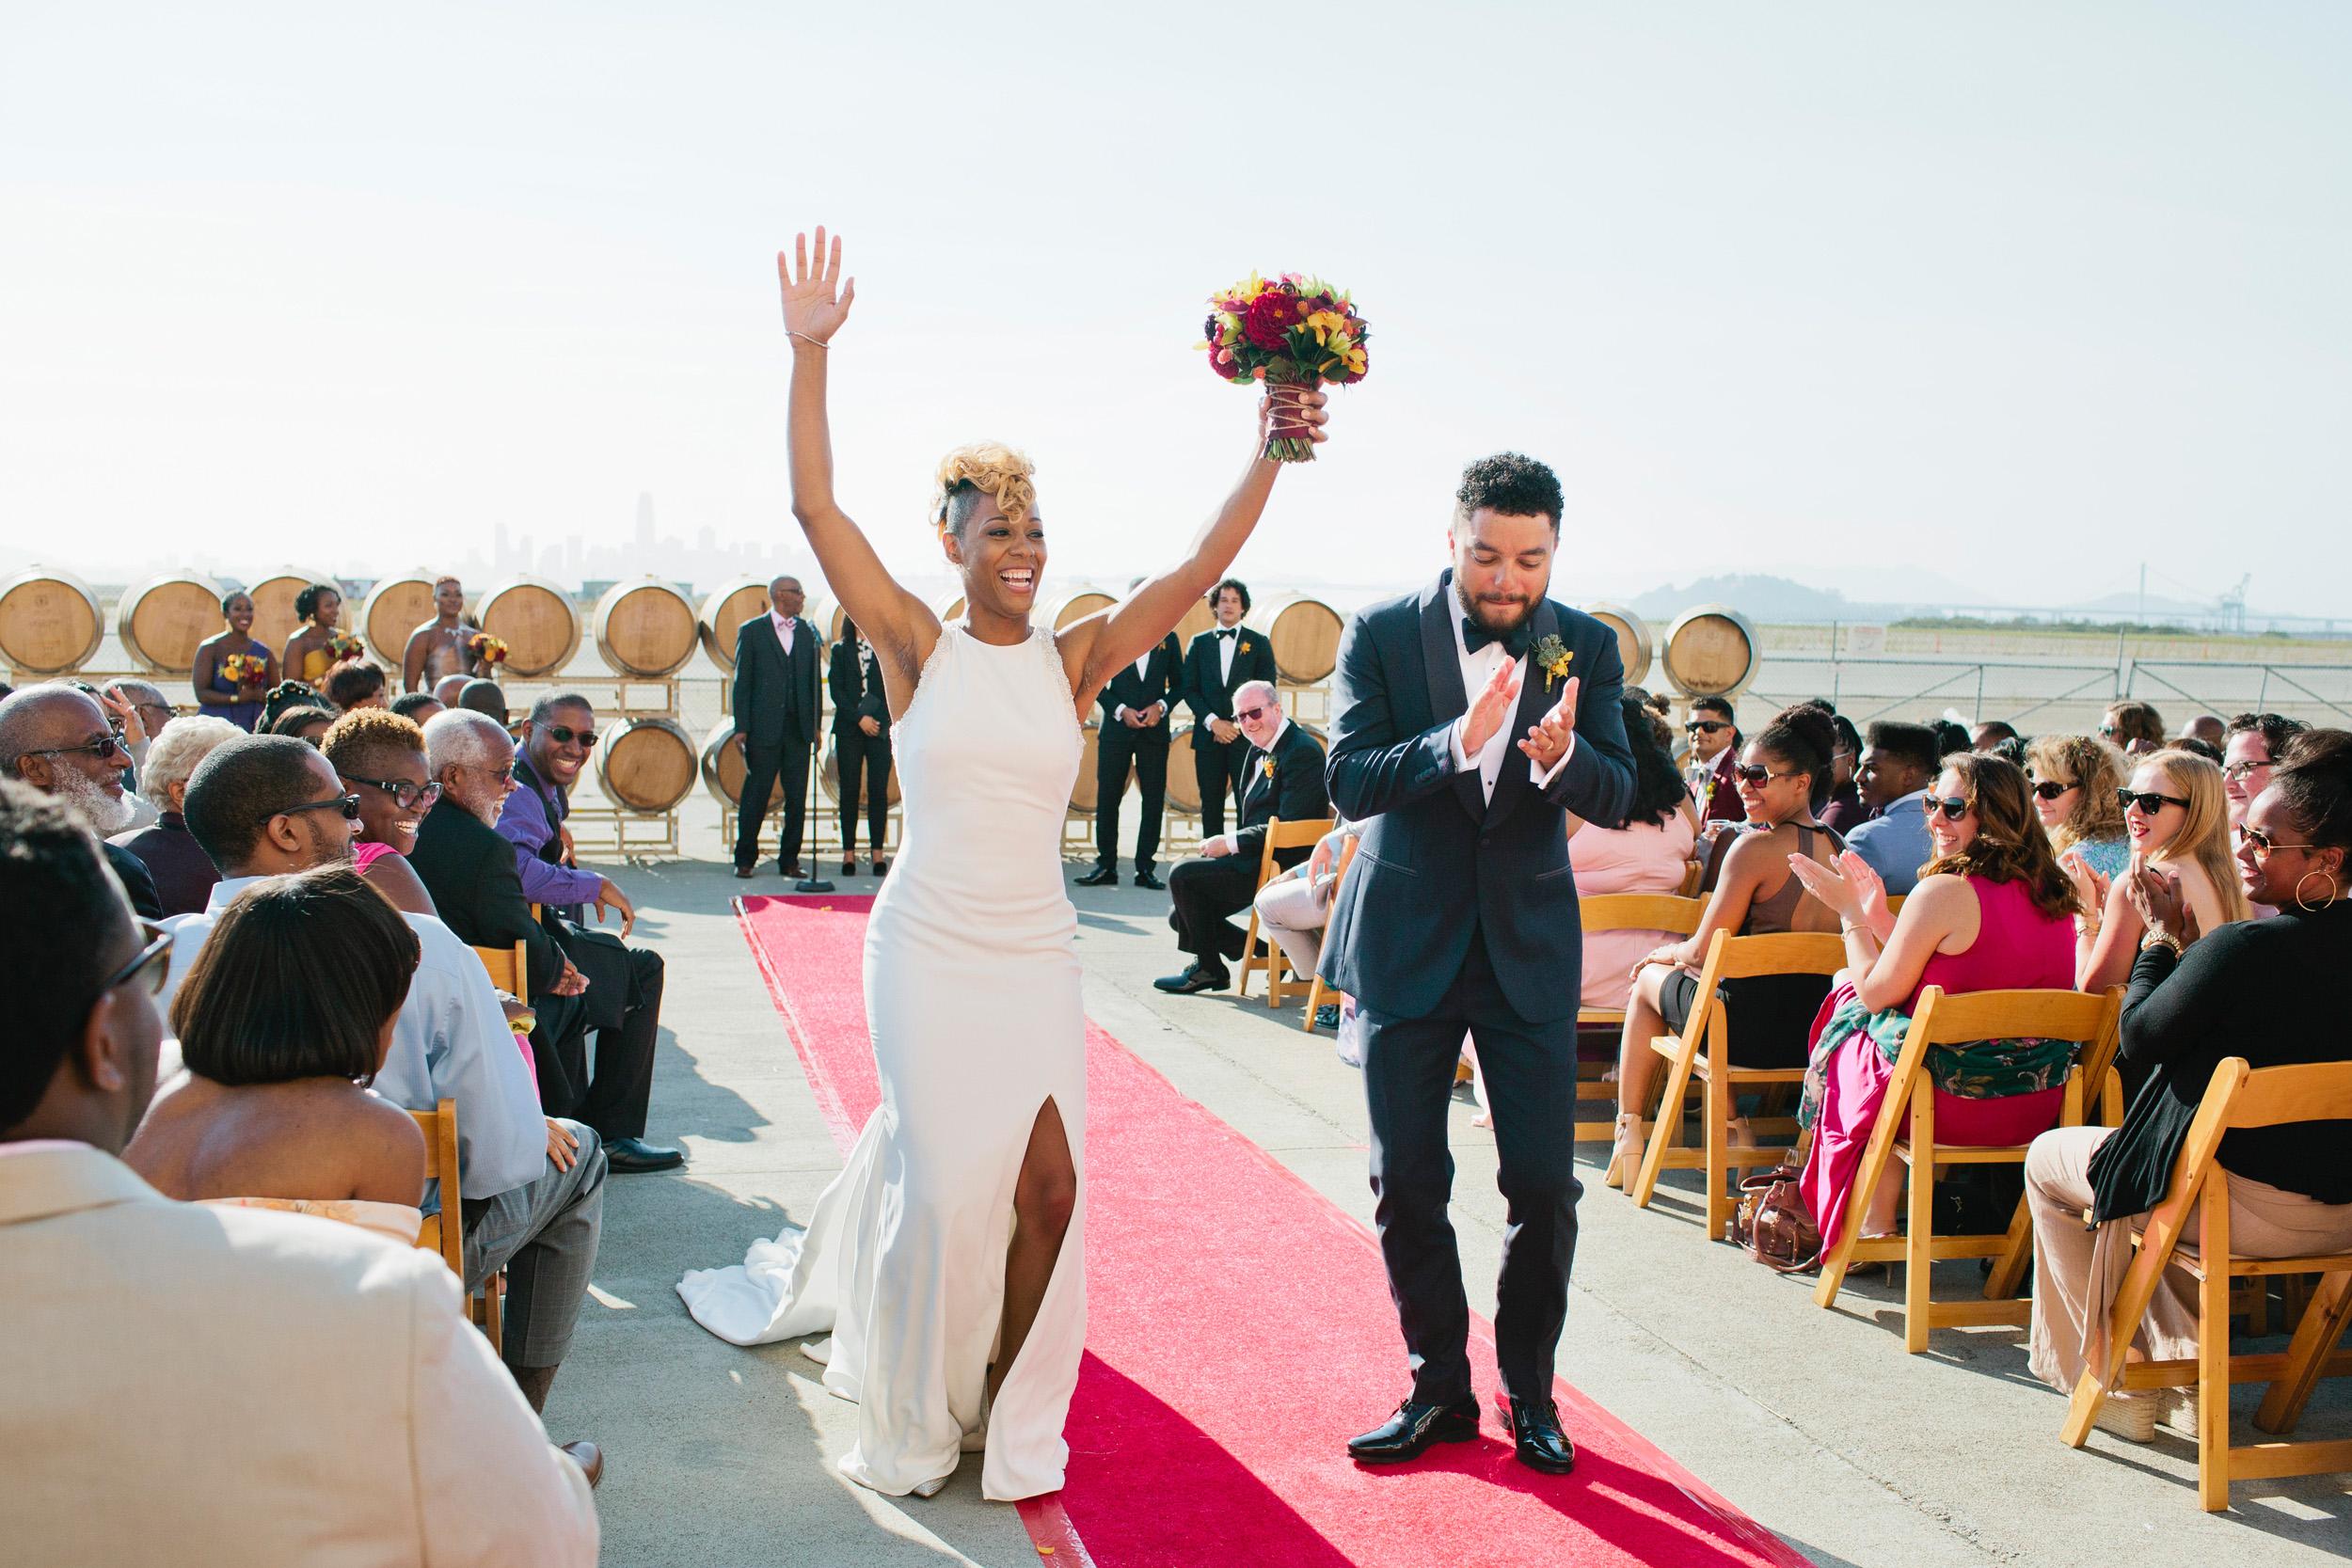 Alameda-Rockwall-Winery-Wedding-033.JPG